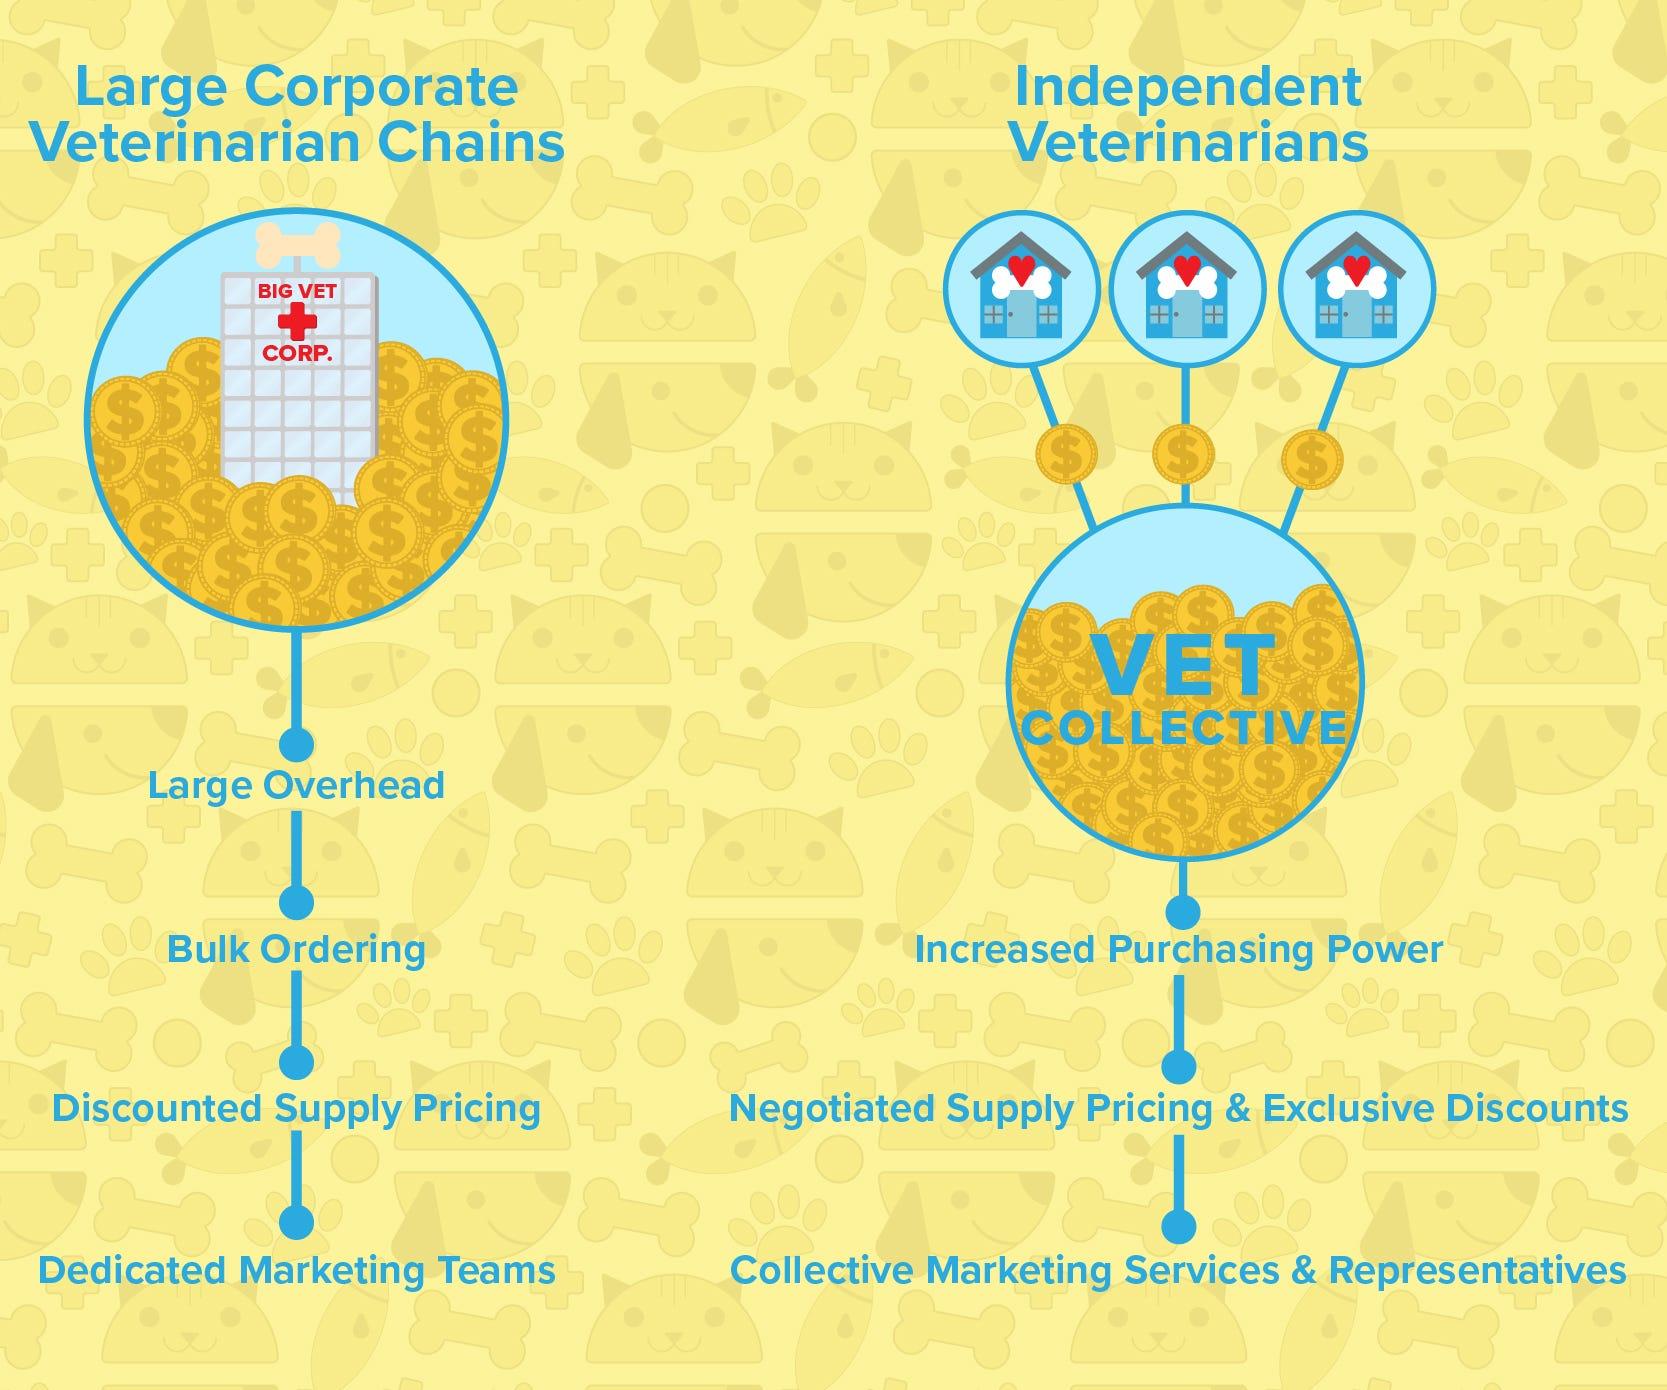 TVC Veterinary Collective Discounts